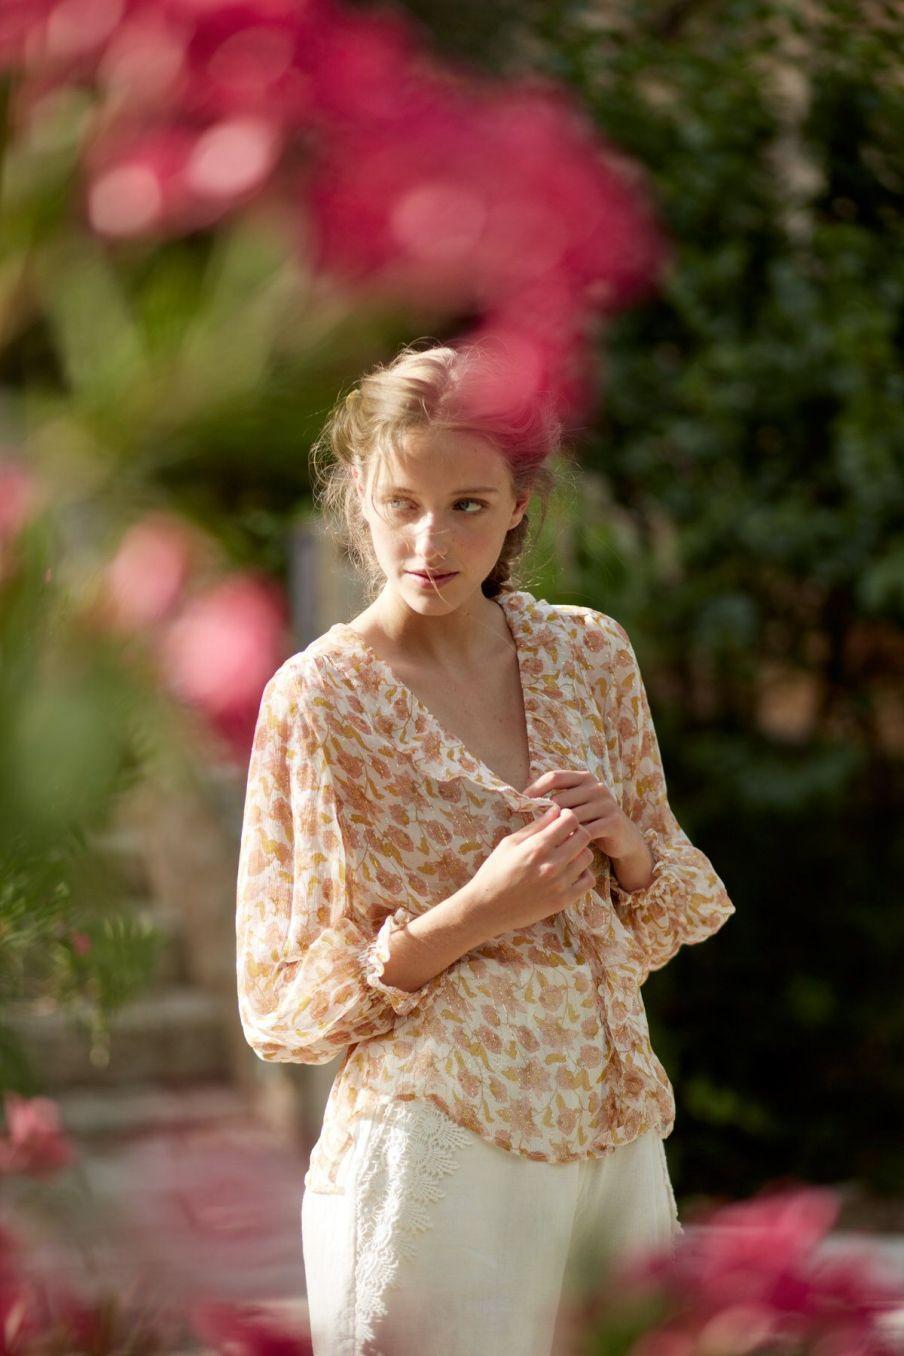 boheme chic vintage blouse femme lorine blush flowers lurex